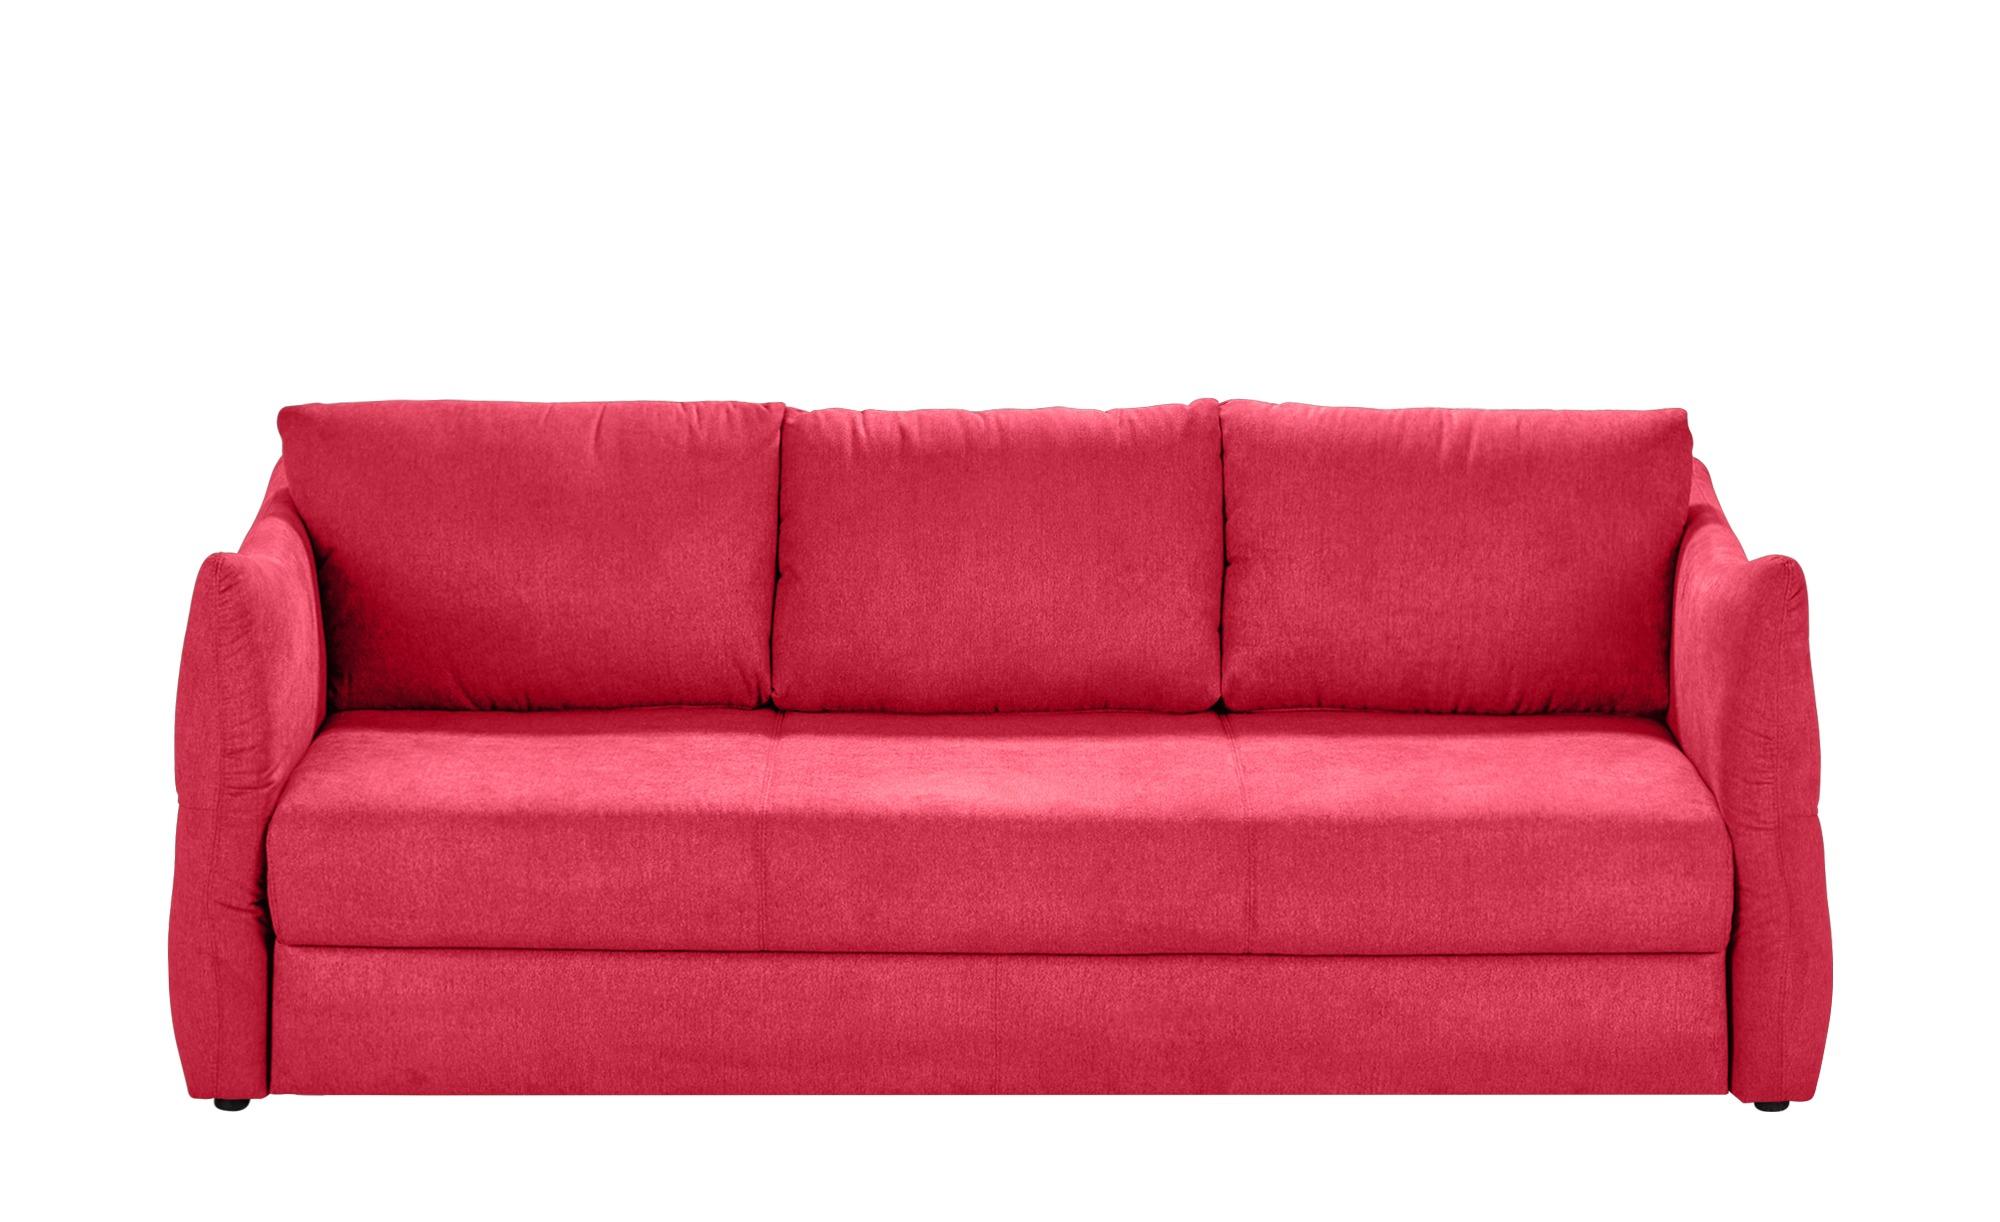 smart Sofa 3-sitzig - rot - 226 cm - 100 cm - 87 cm - Polstermöbel > Sofas > 3-Sitzer - Möbel Kraft